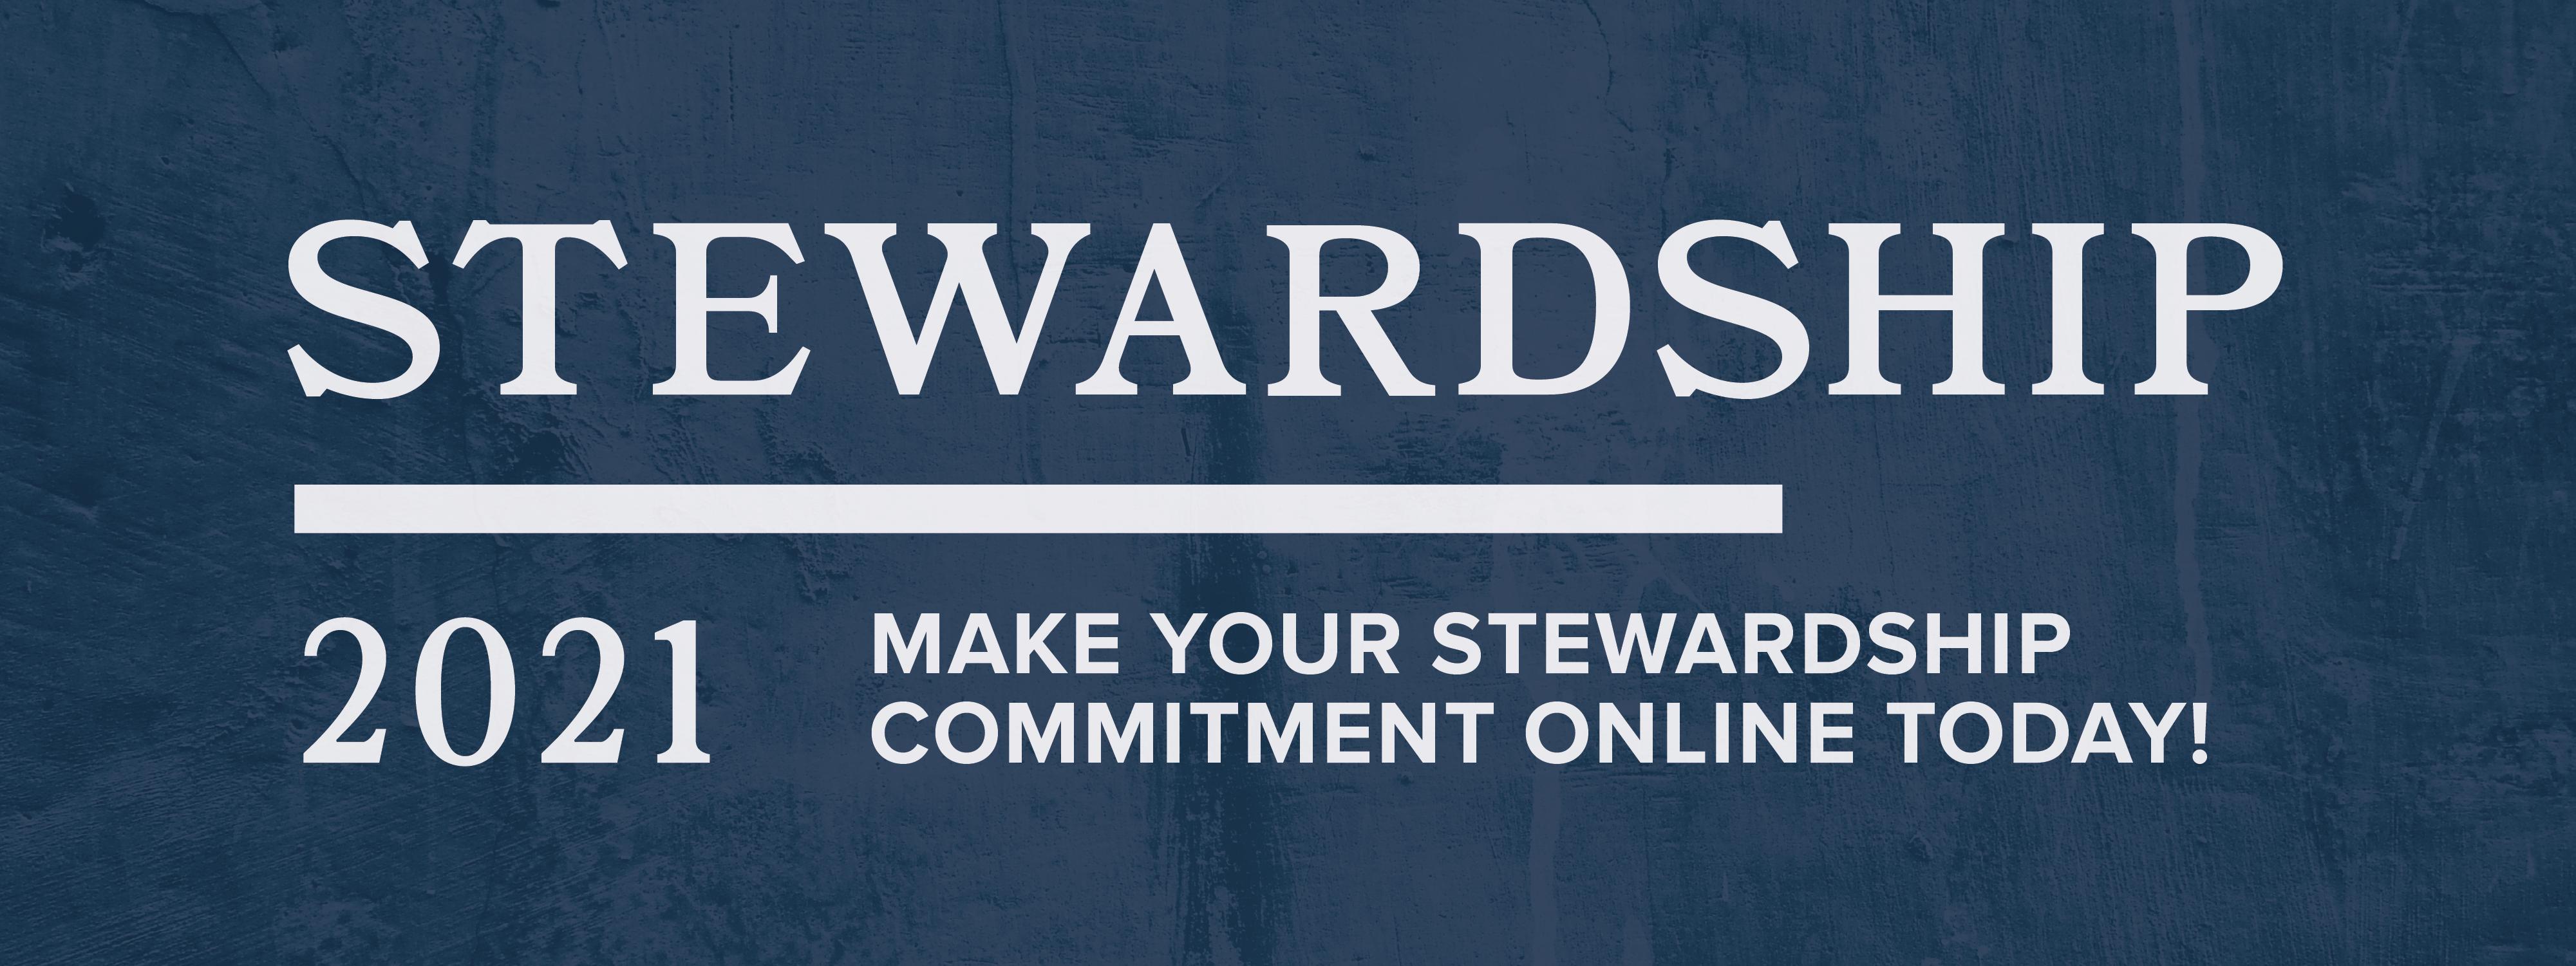 Stewardship Pledge 2021